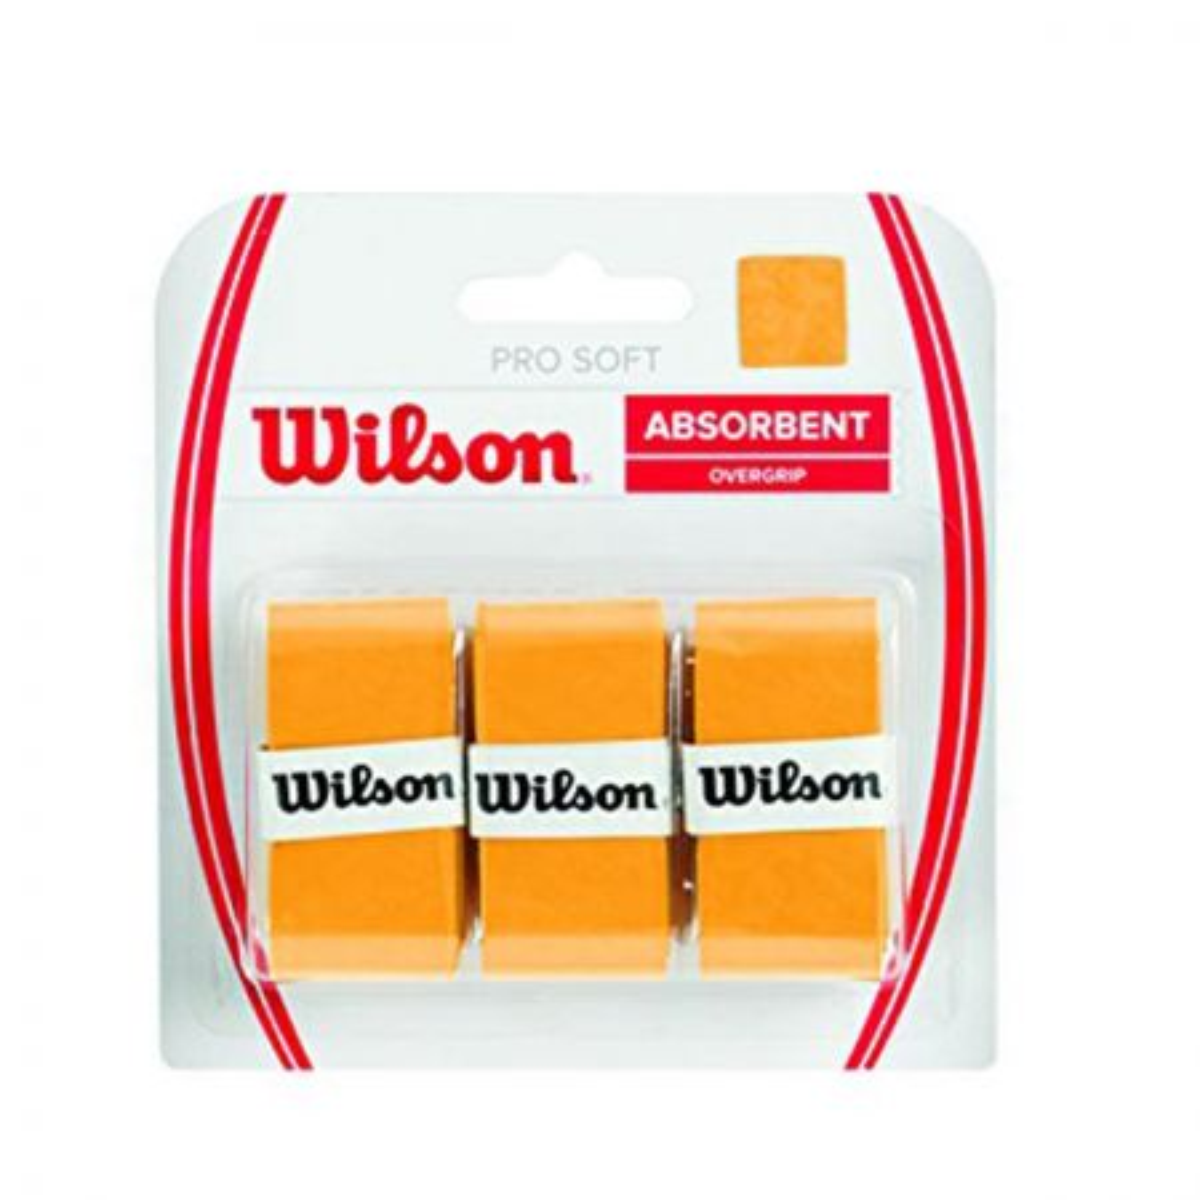 Wilson Pro Soft Overgrip 0,55mm grip